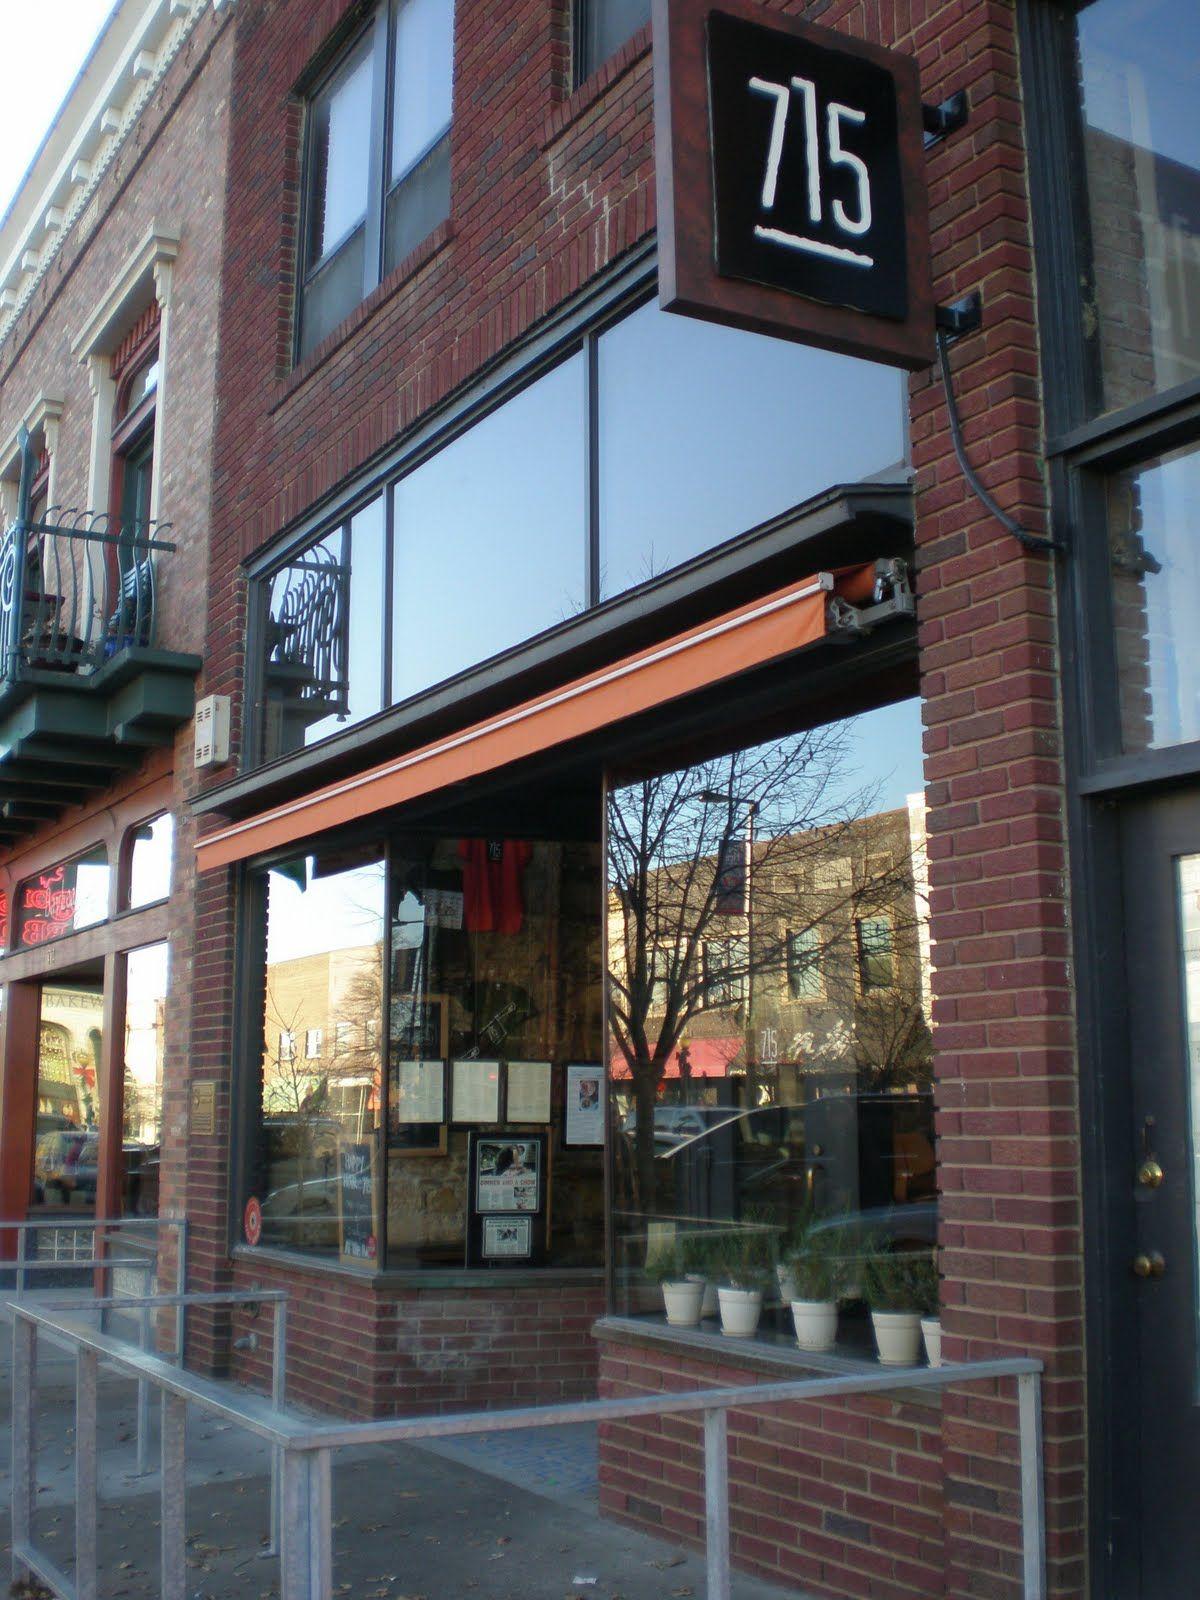 715 Restaurant Lawrence Kansas I Want To Go Here